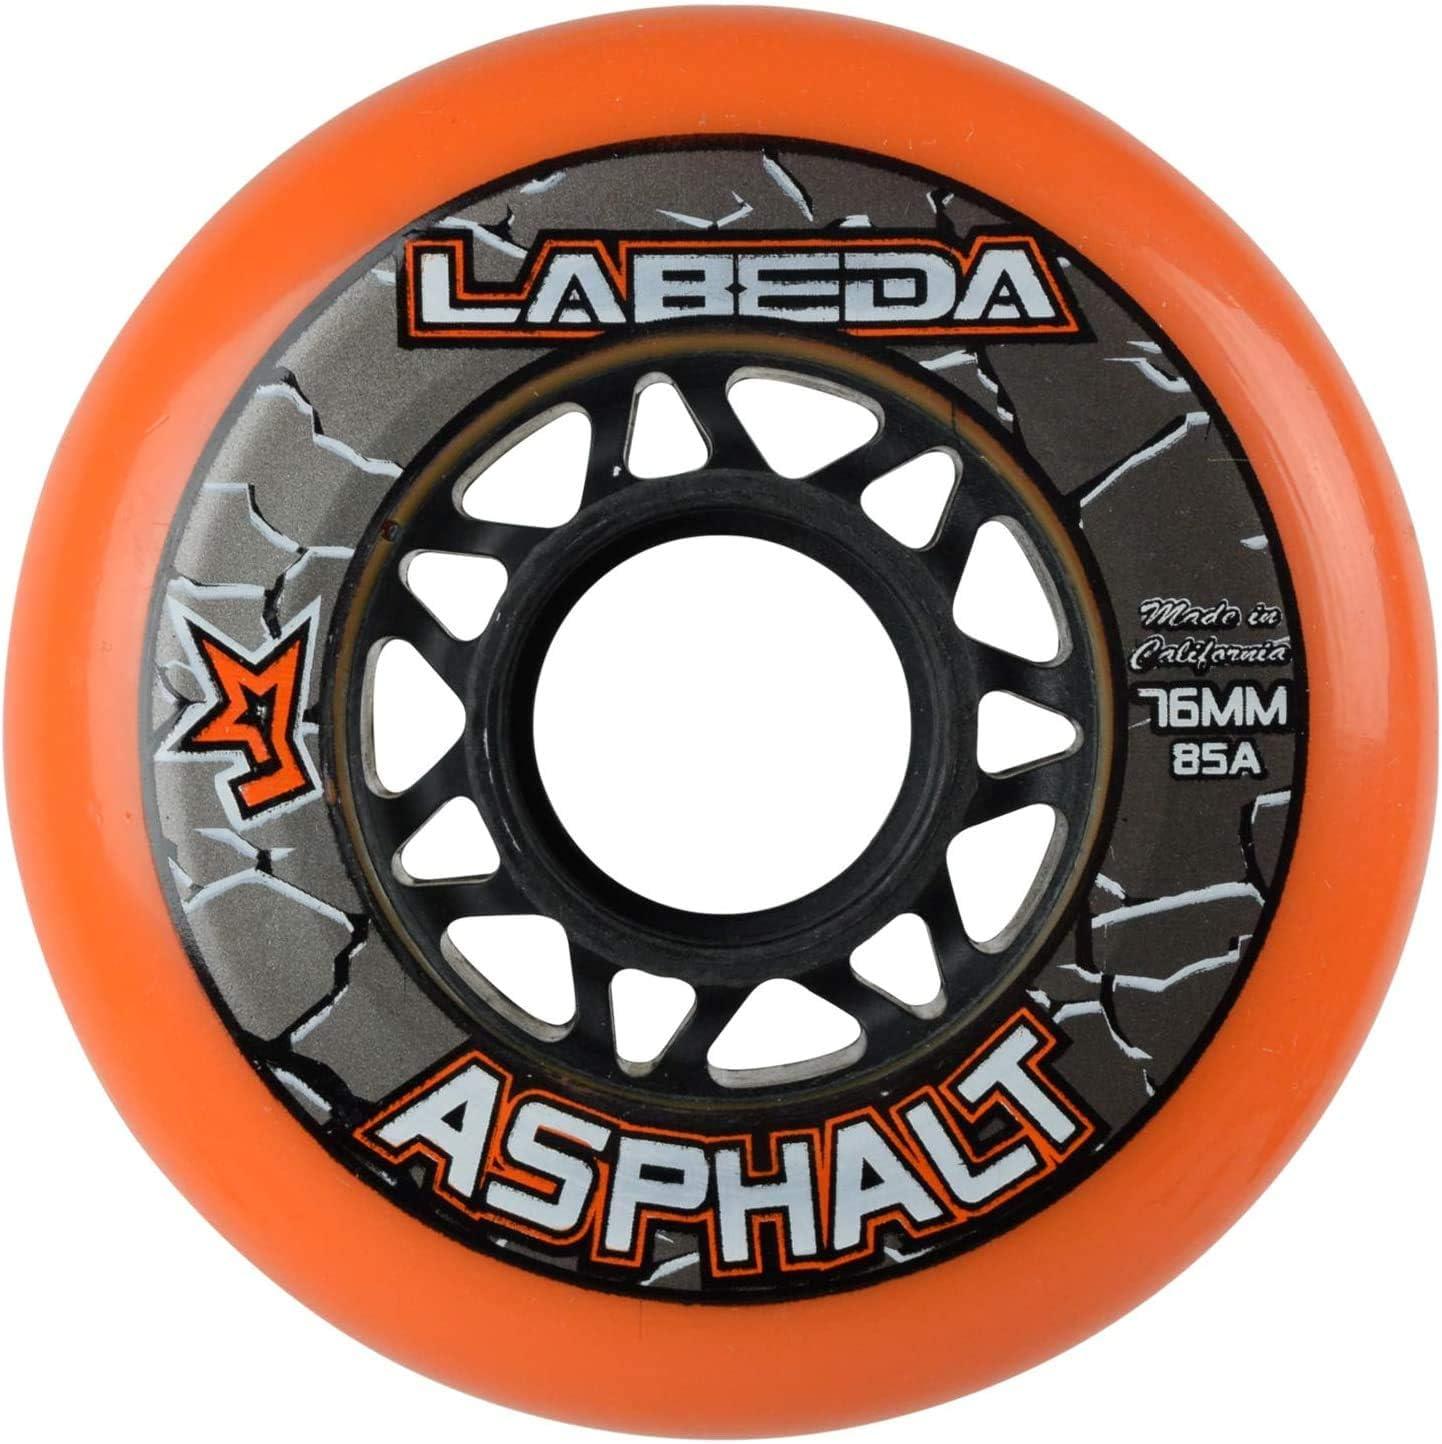 76mm w//Dragon Bearings Labeda Asphalt Outdoor Inline Hockey Wheels